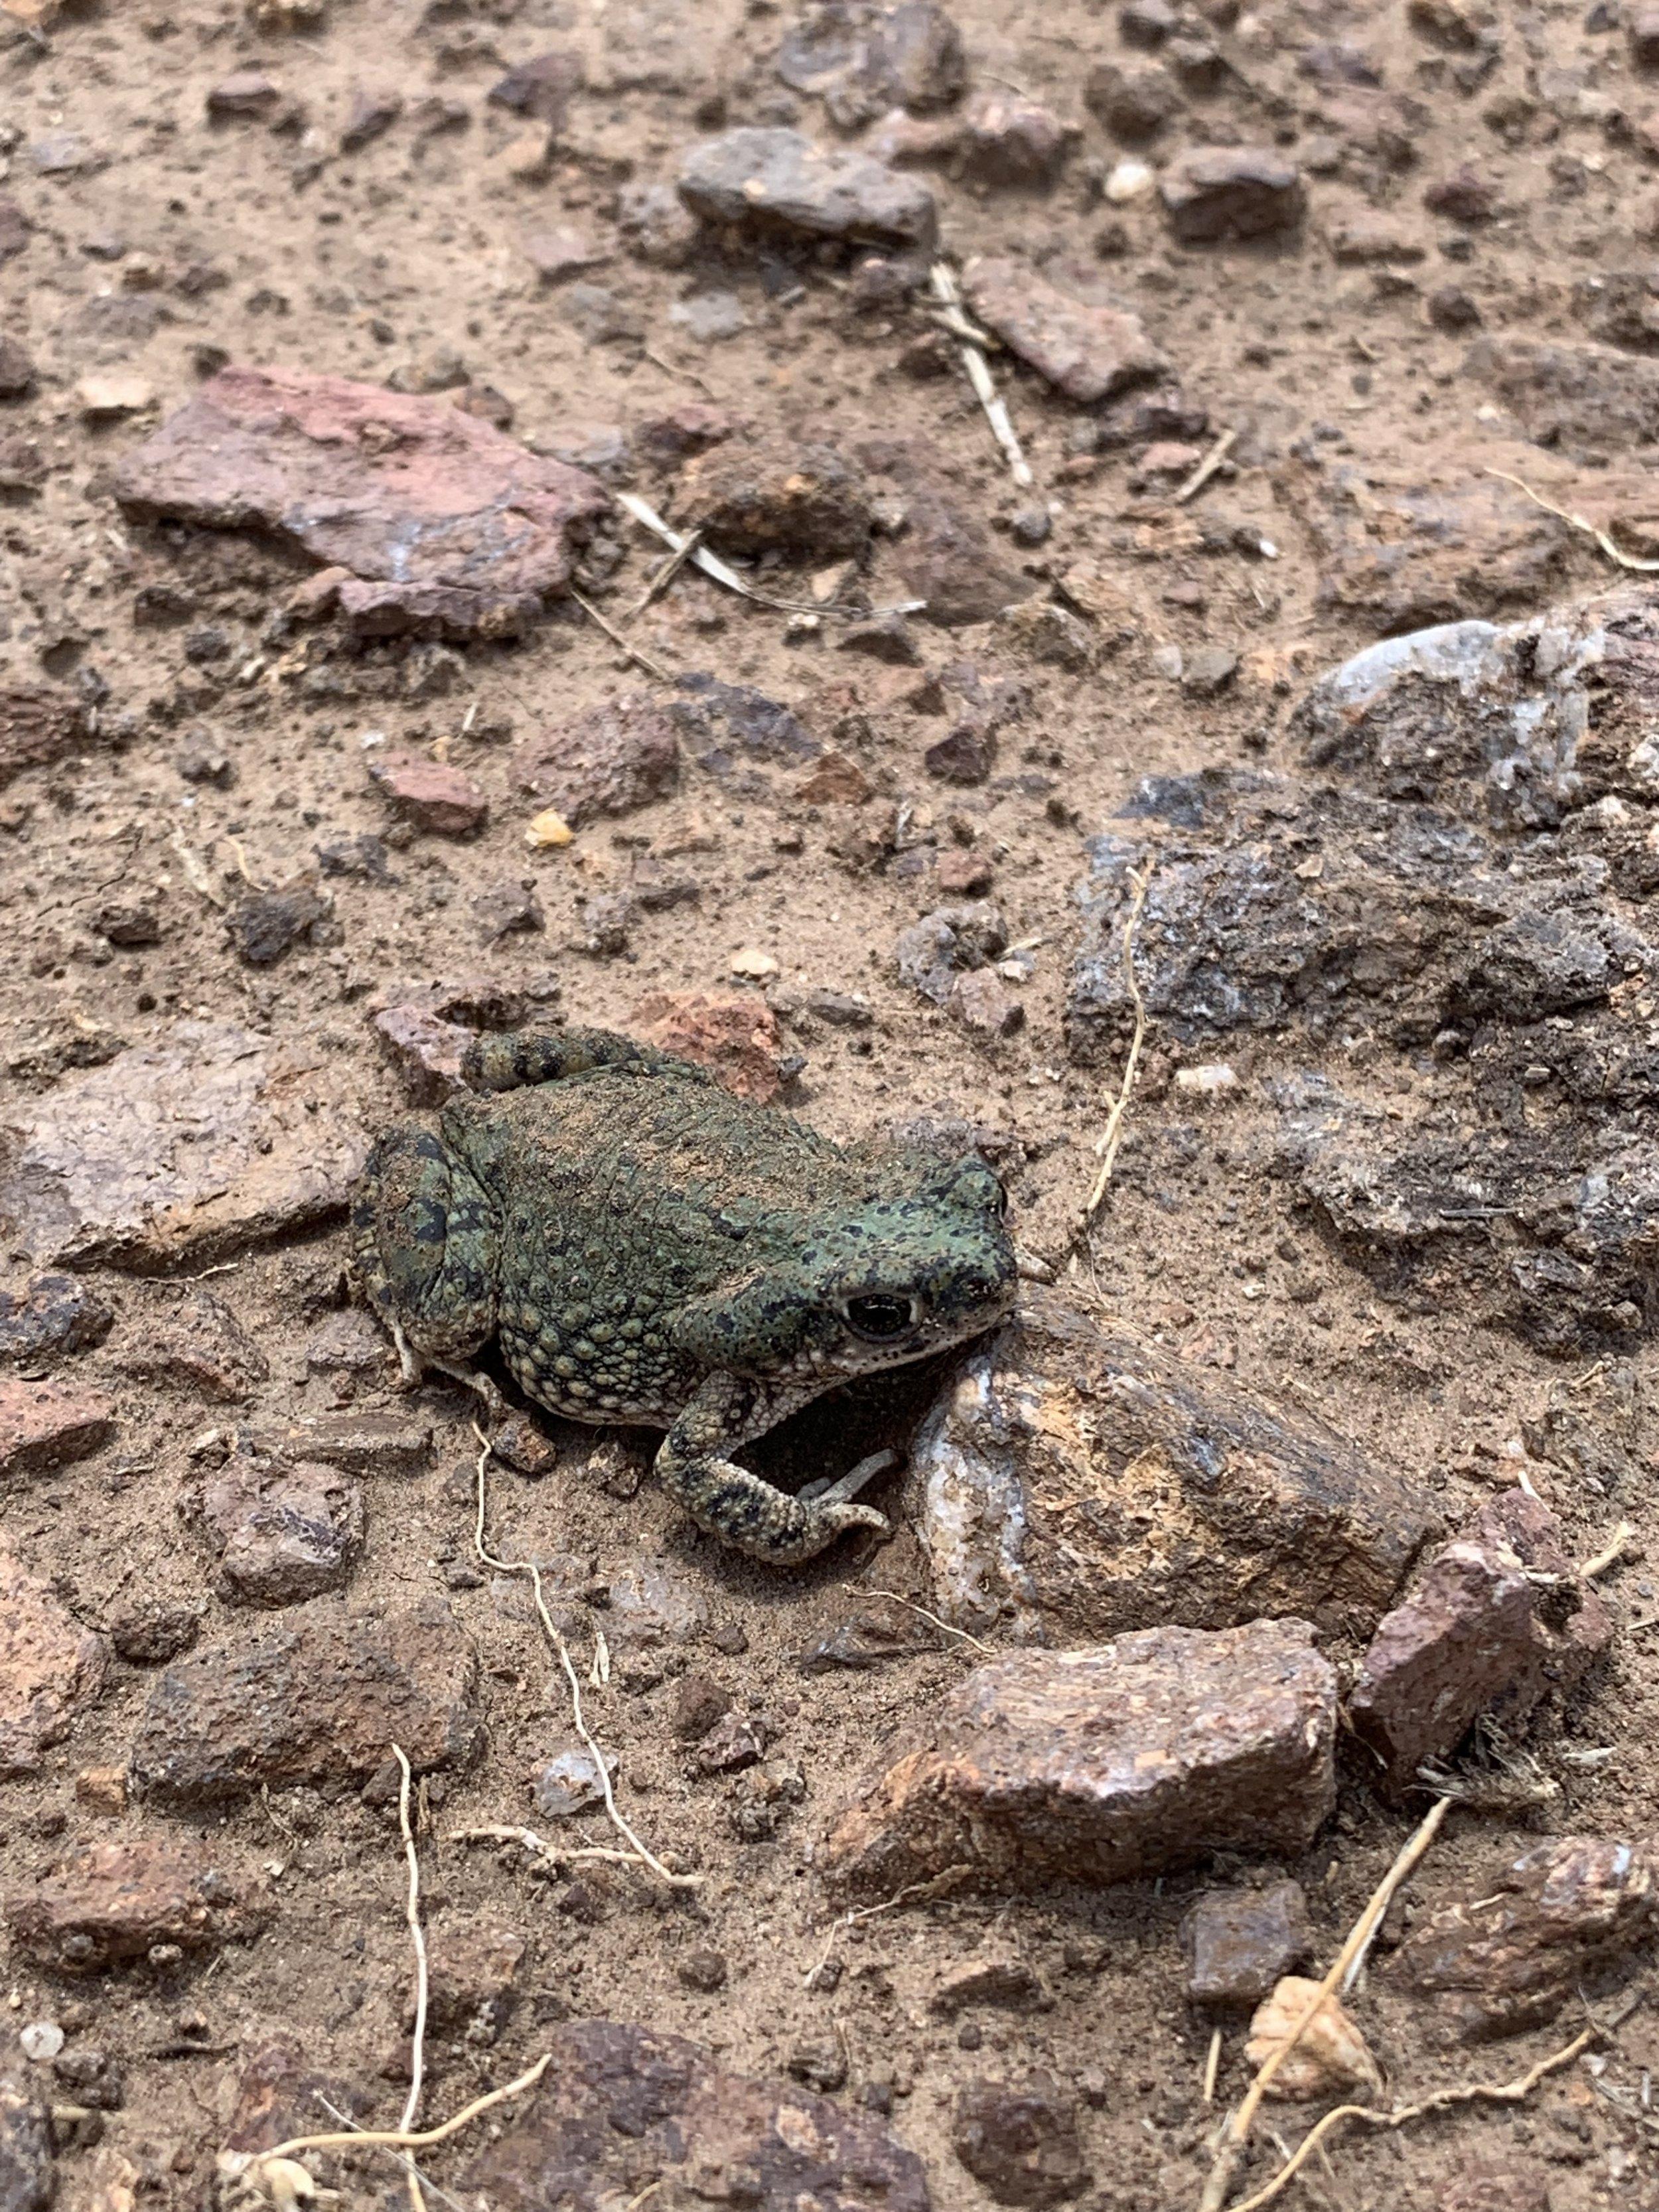 A Texas Toad